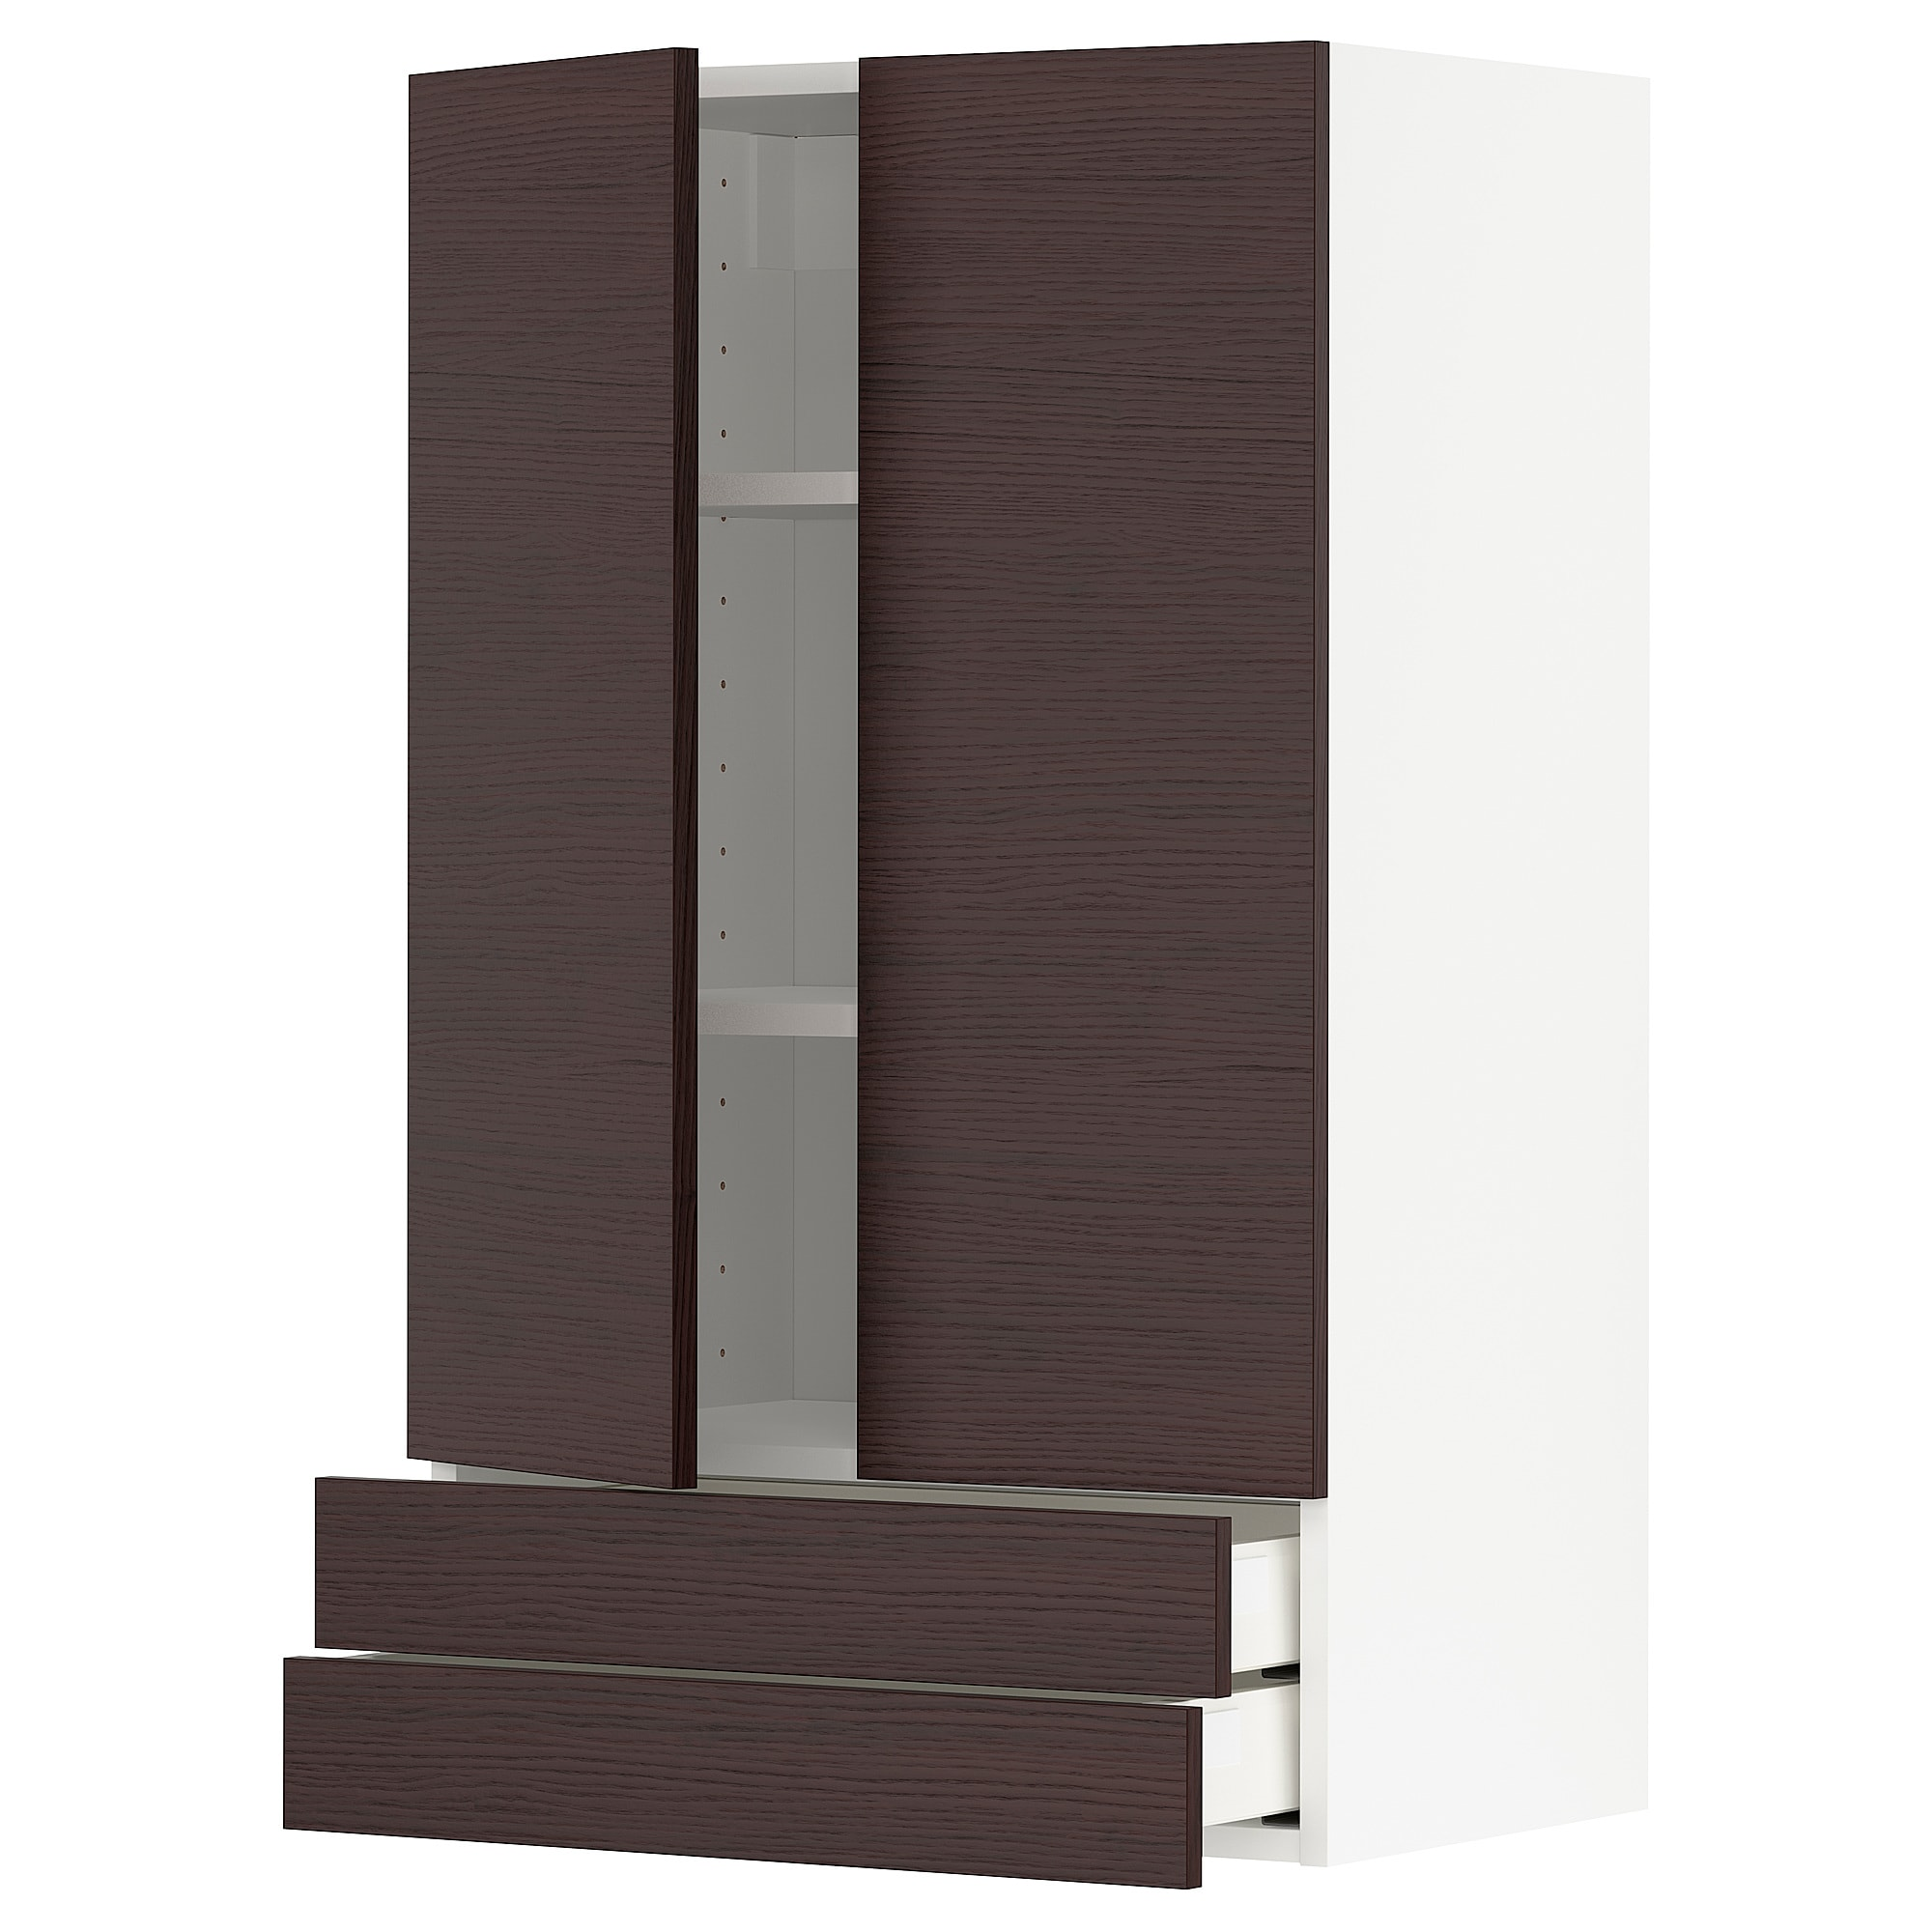 metod / maximera навісна шафа 2 дверцят/2 шухляди